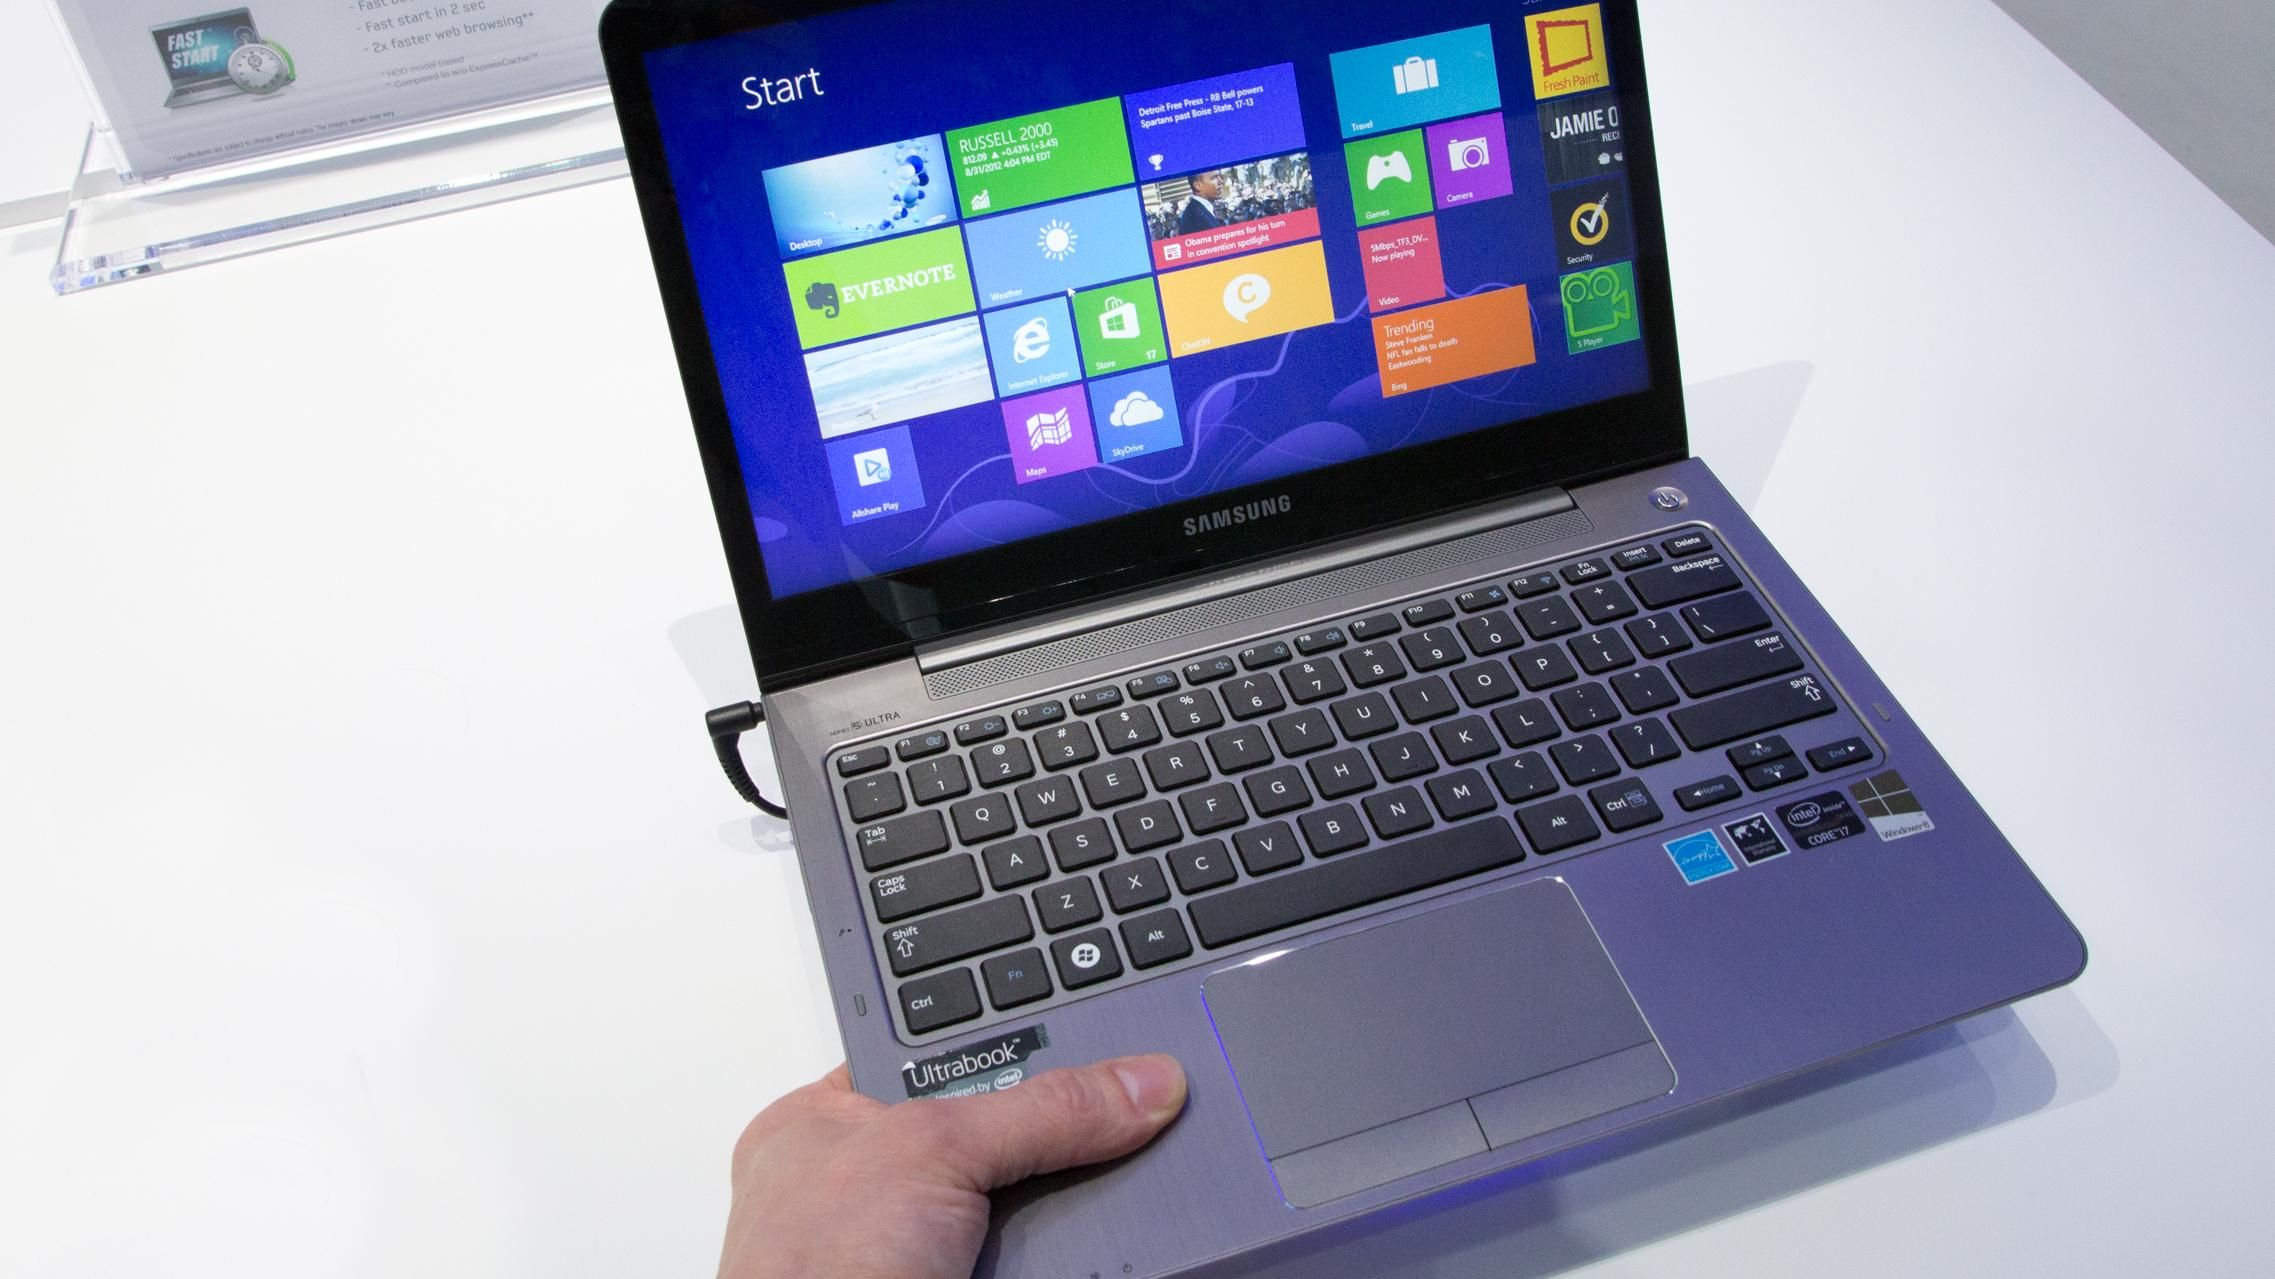 Samsungs 5 serie Ultrabook